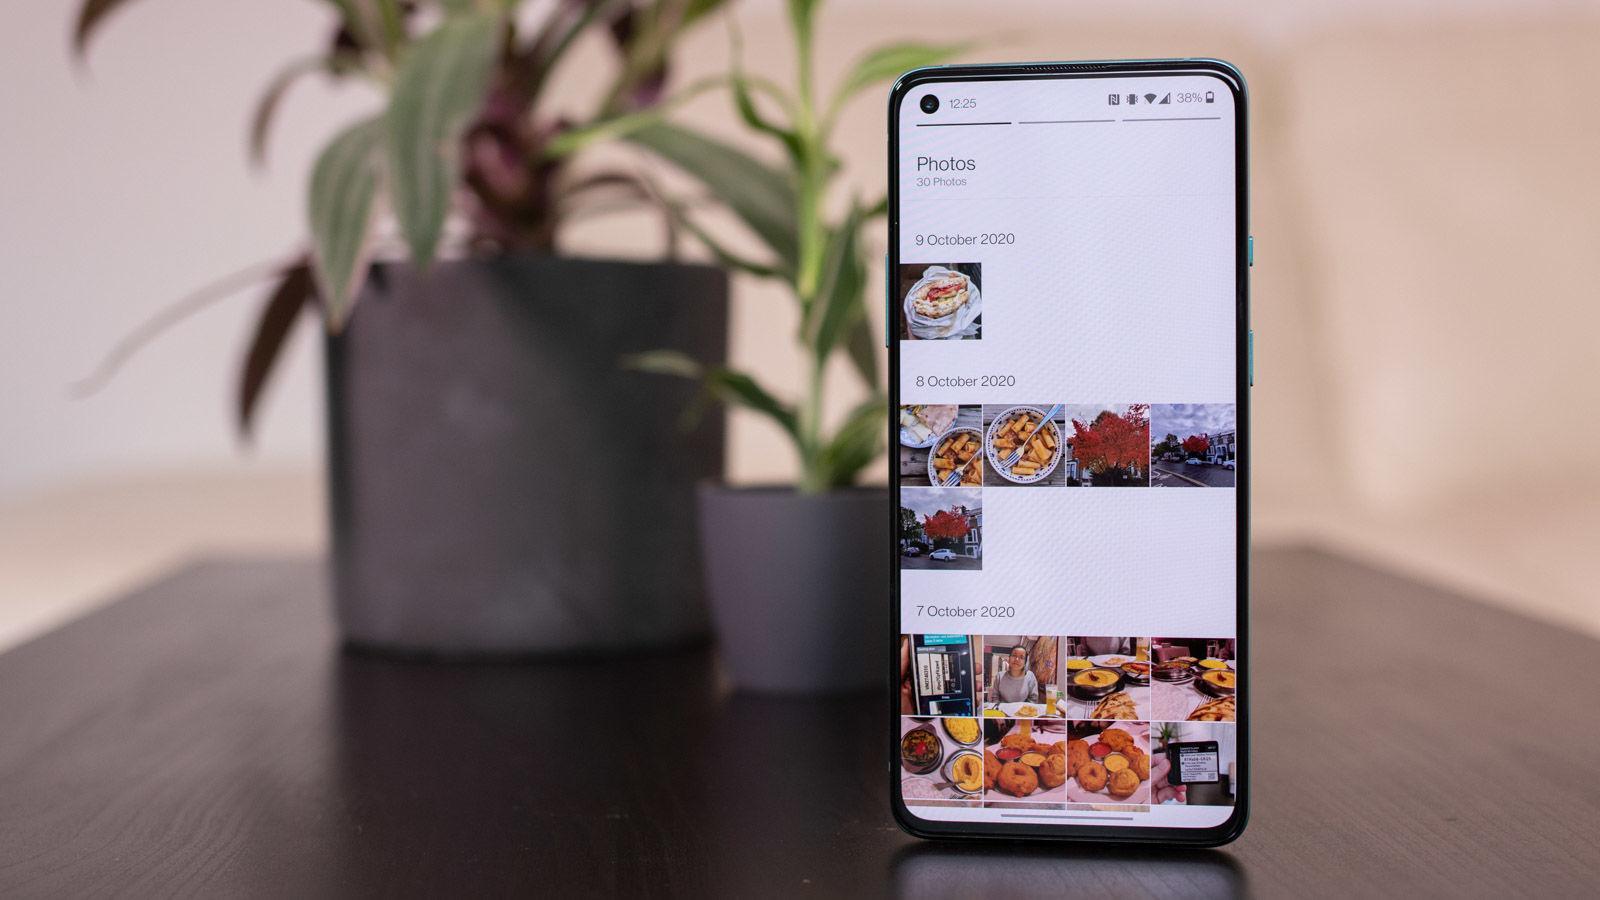 OnePlus 8T photos